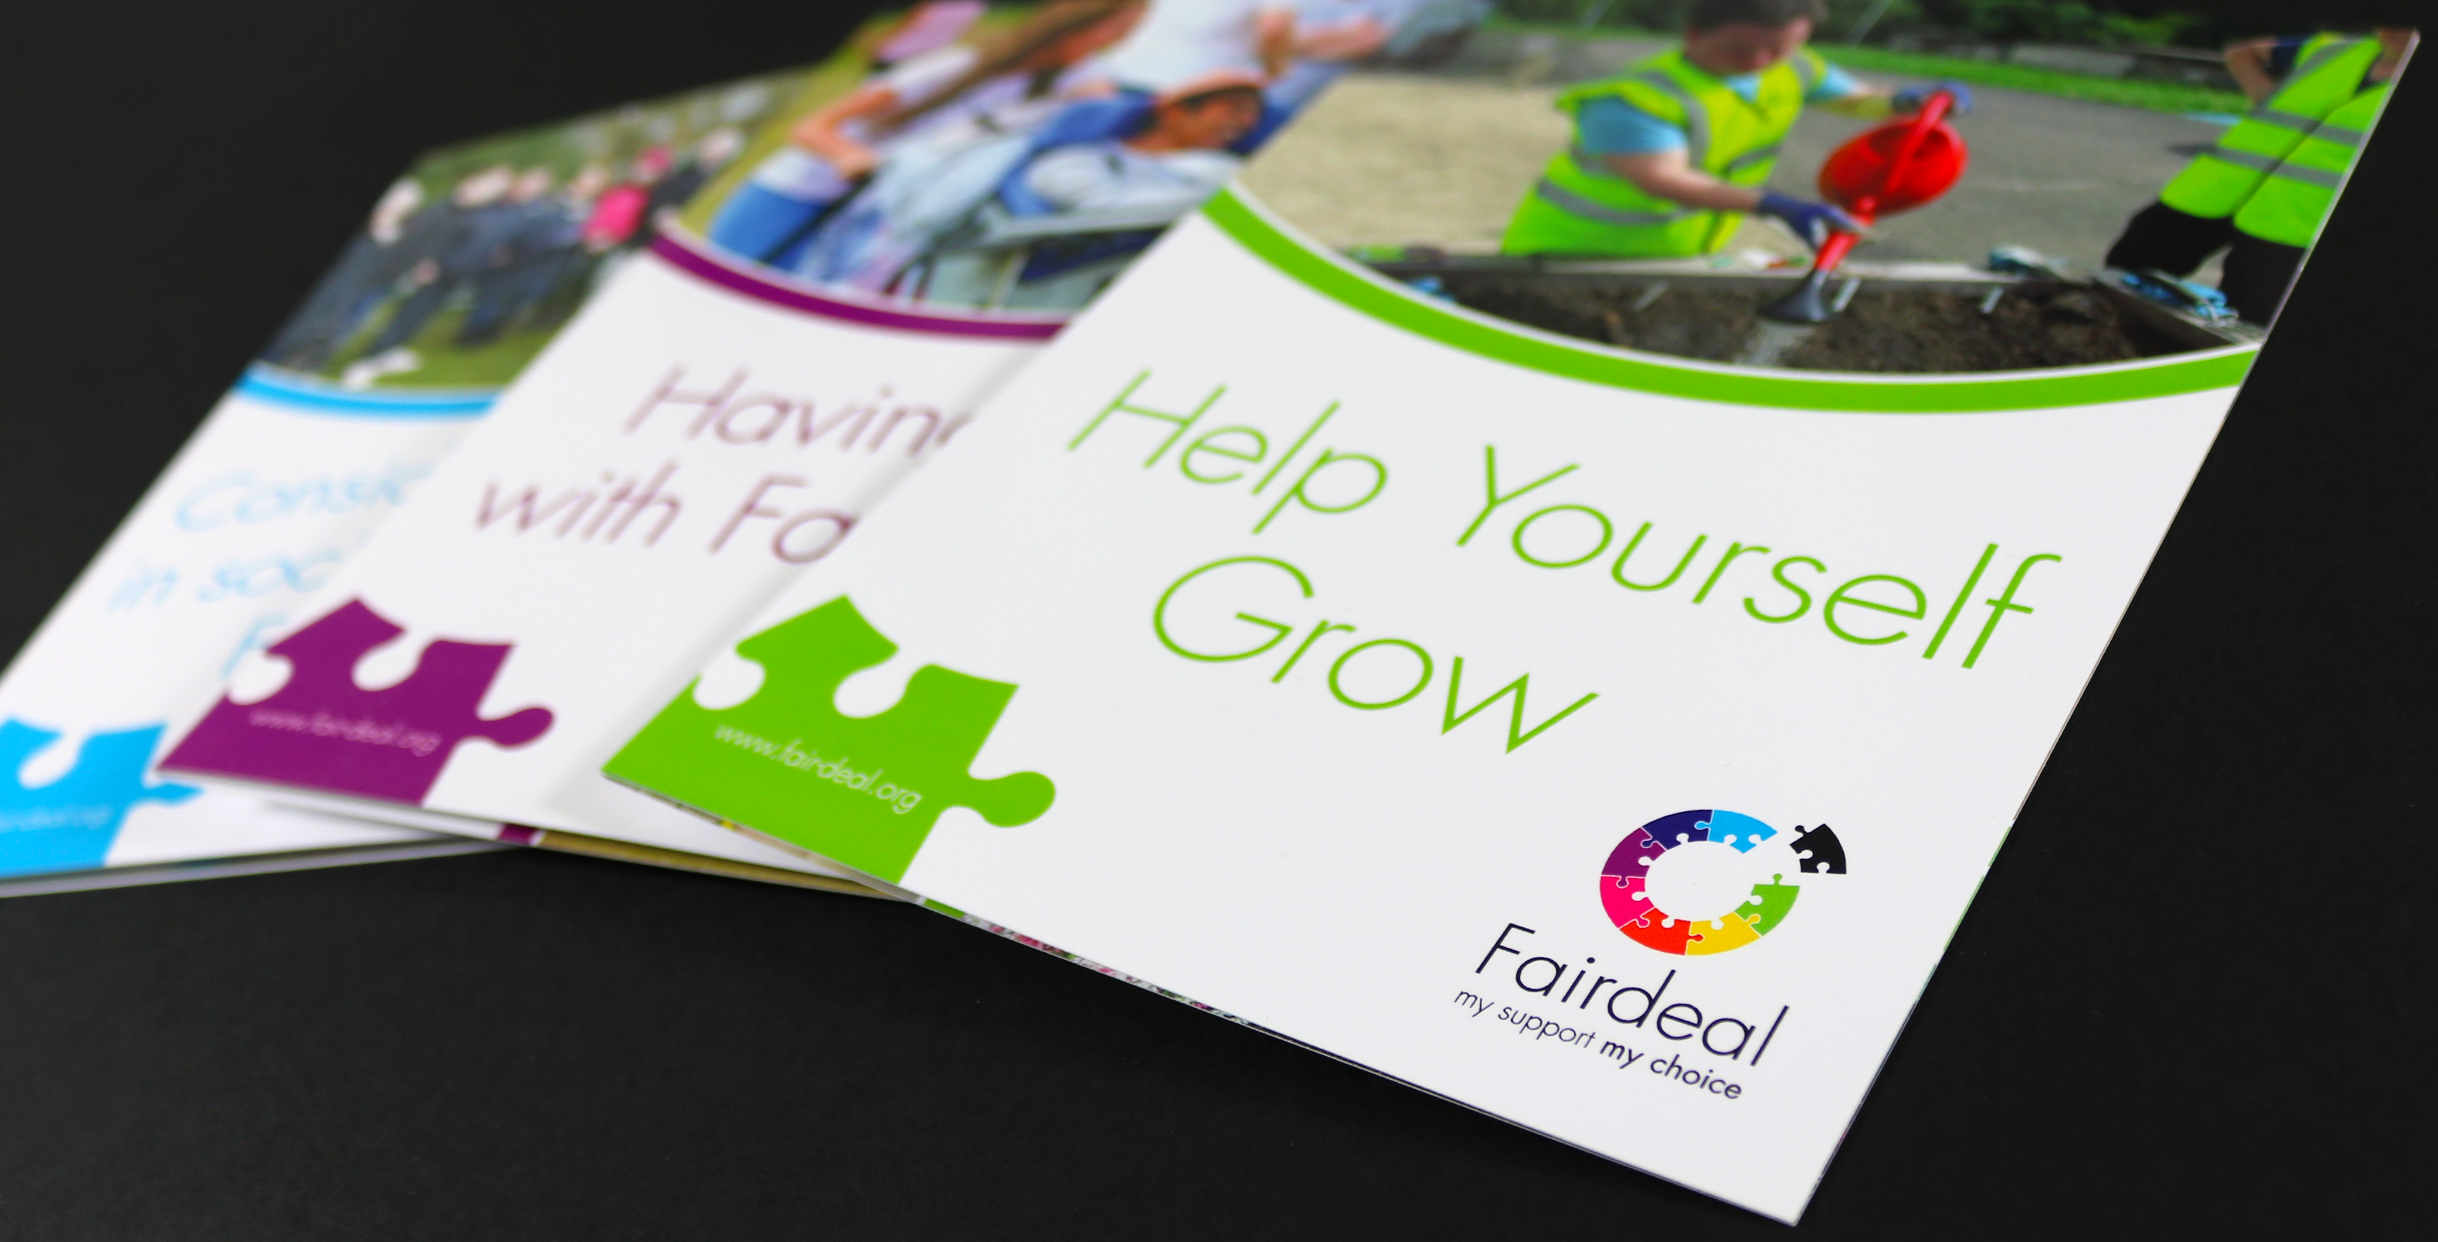 Leaflet design for Glasgow based charity, Fair Deal